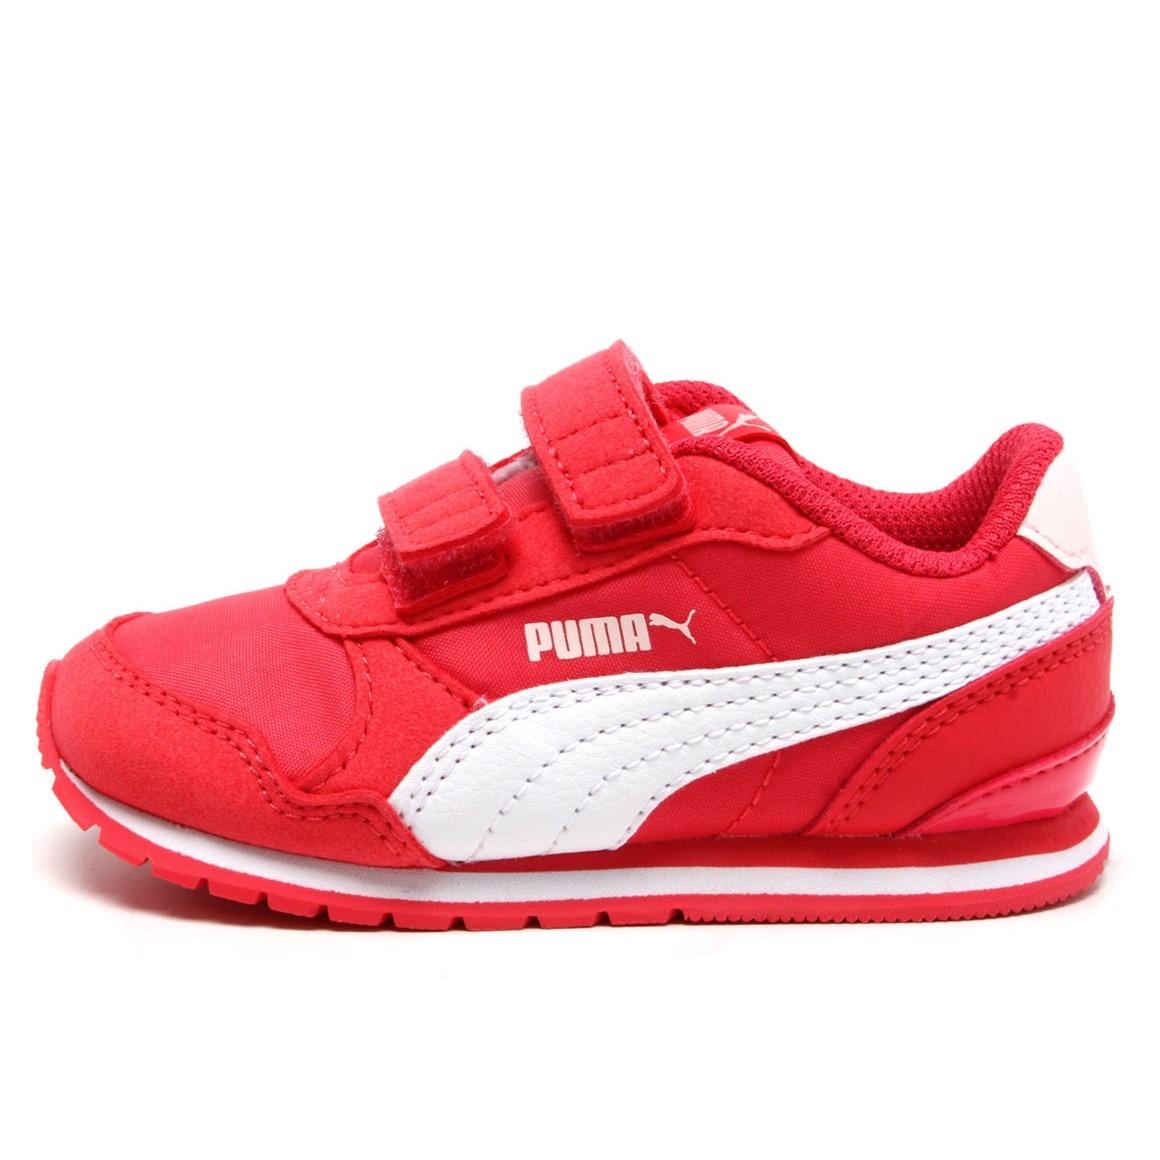 82abc57334aae tênis puma st runner v2 nl pink branco feminino infantil. Carregando zoom.